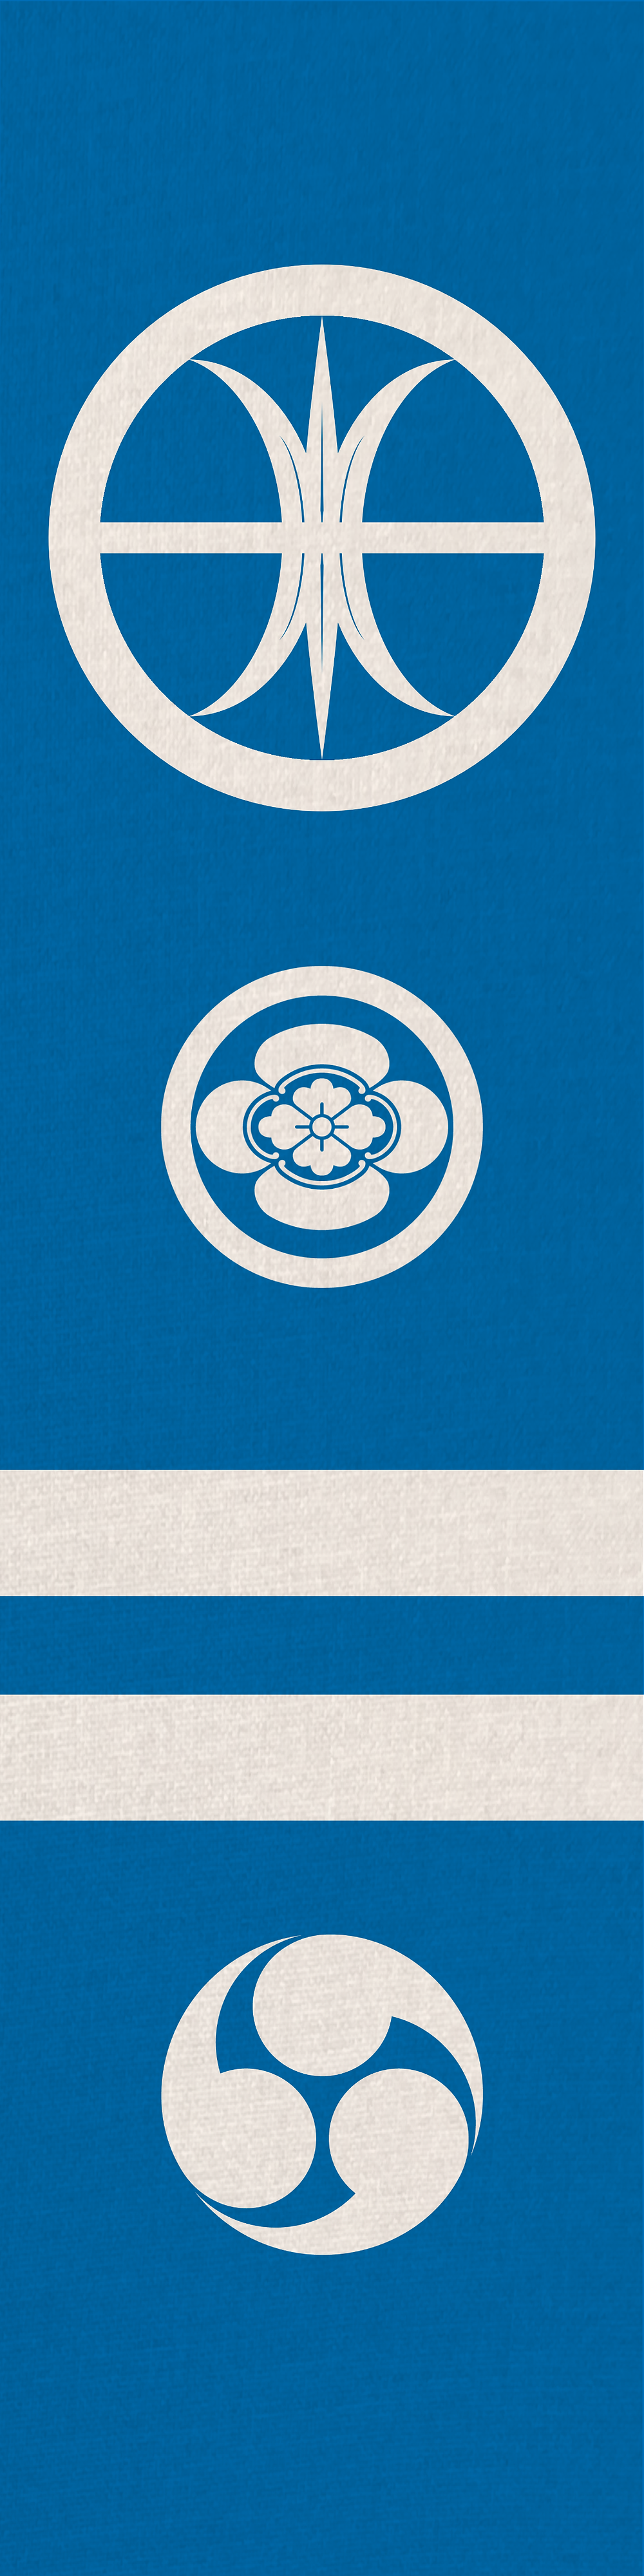 Nae no kai emblem